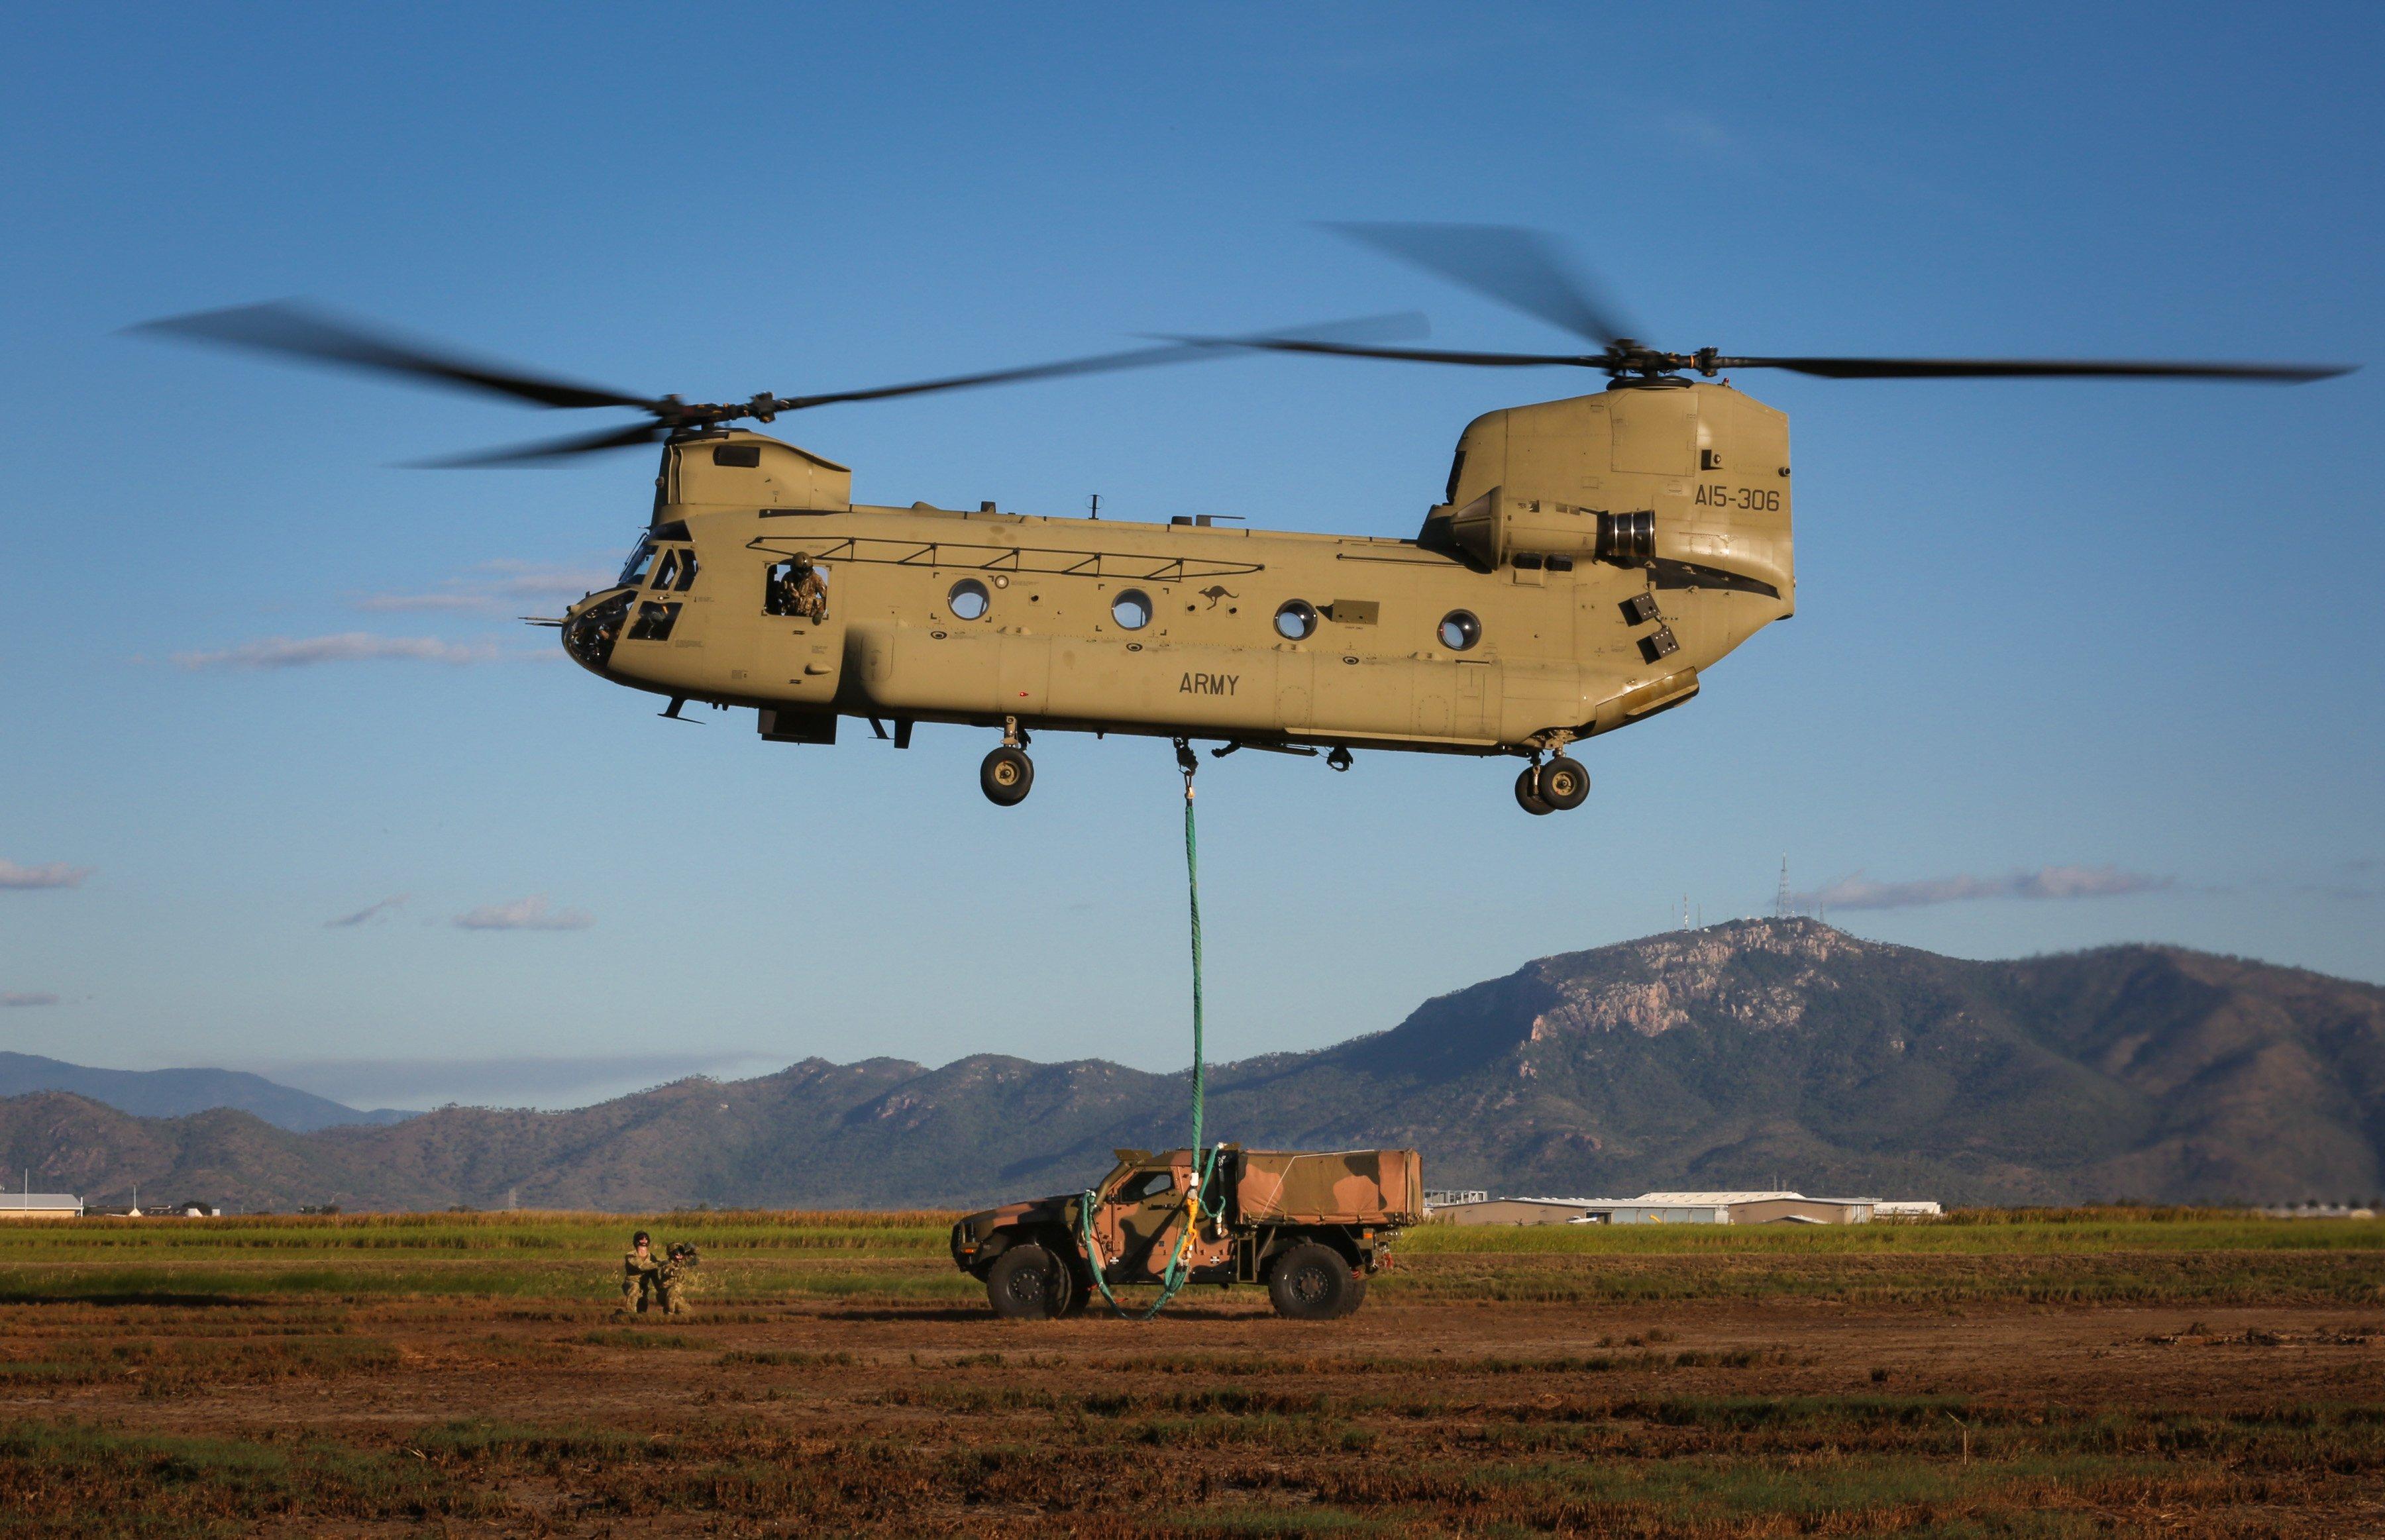 Australian CH-47F [Commonwealth of Australia - Department of Defence/Glen McCarthy]